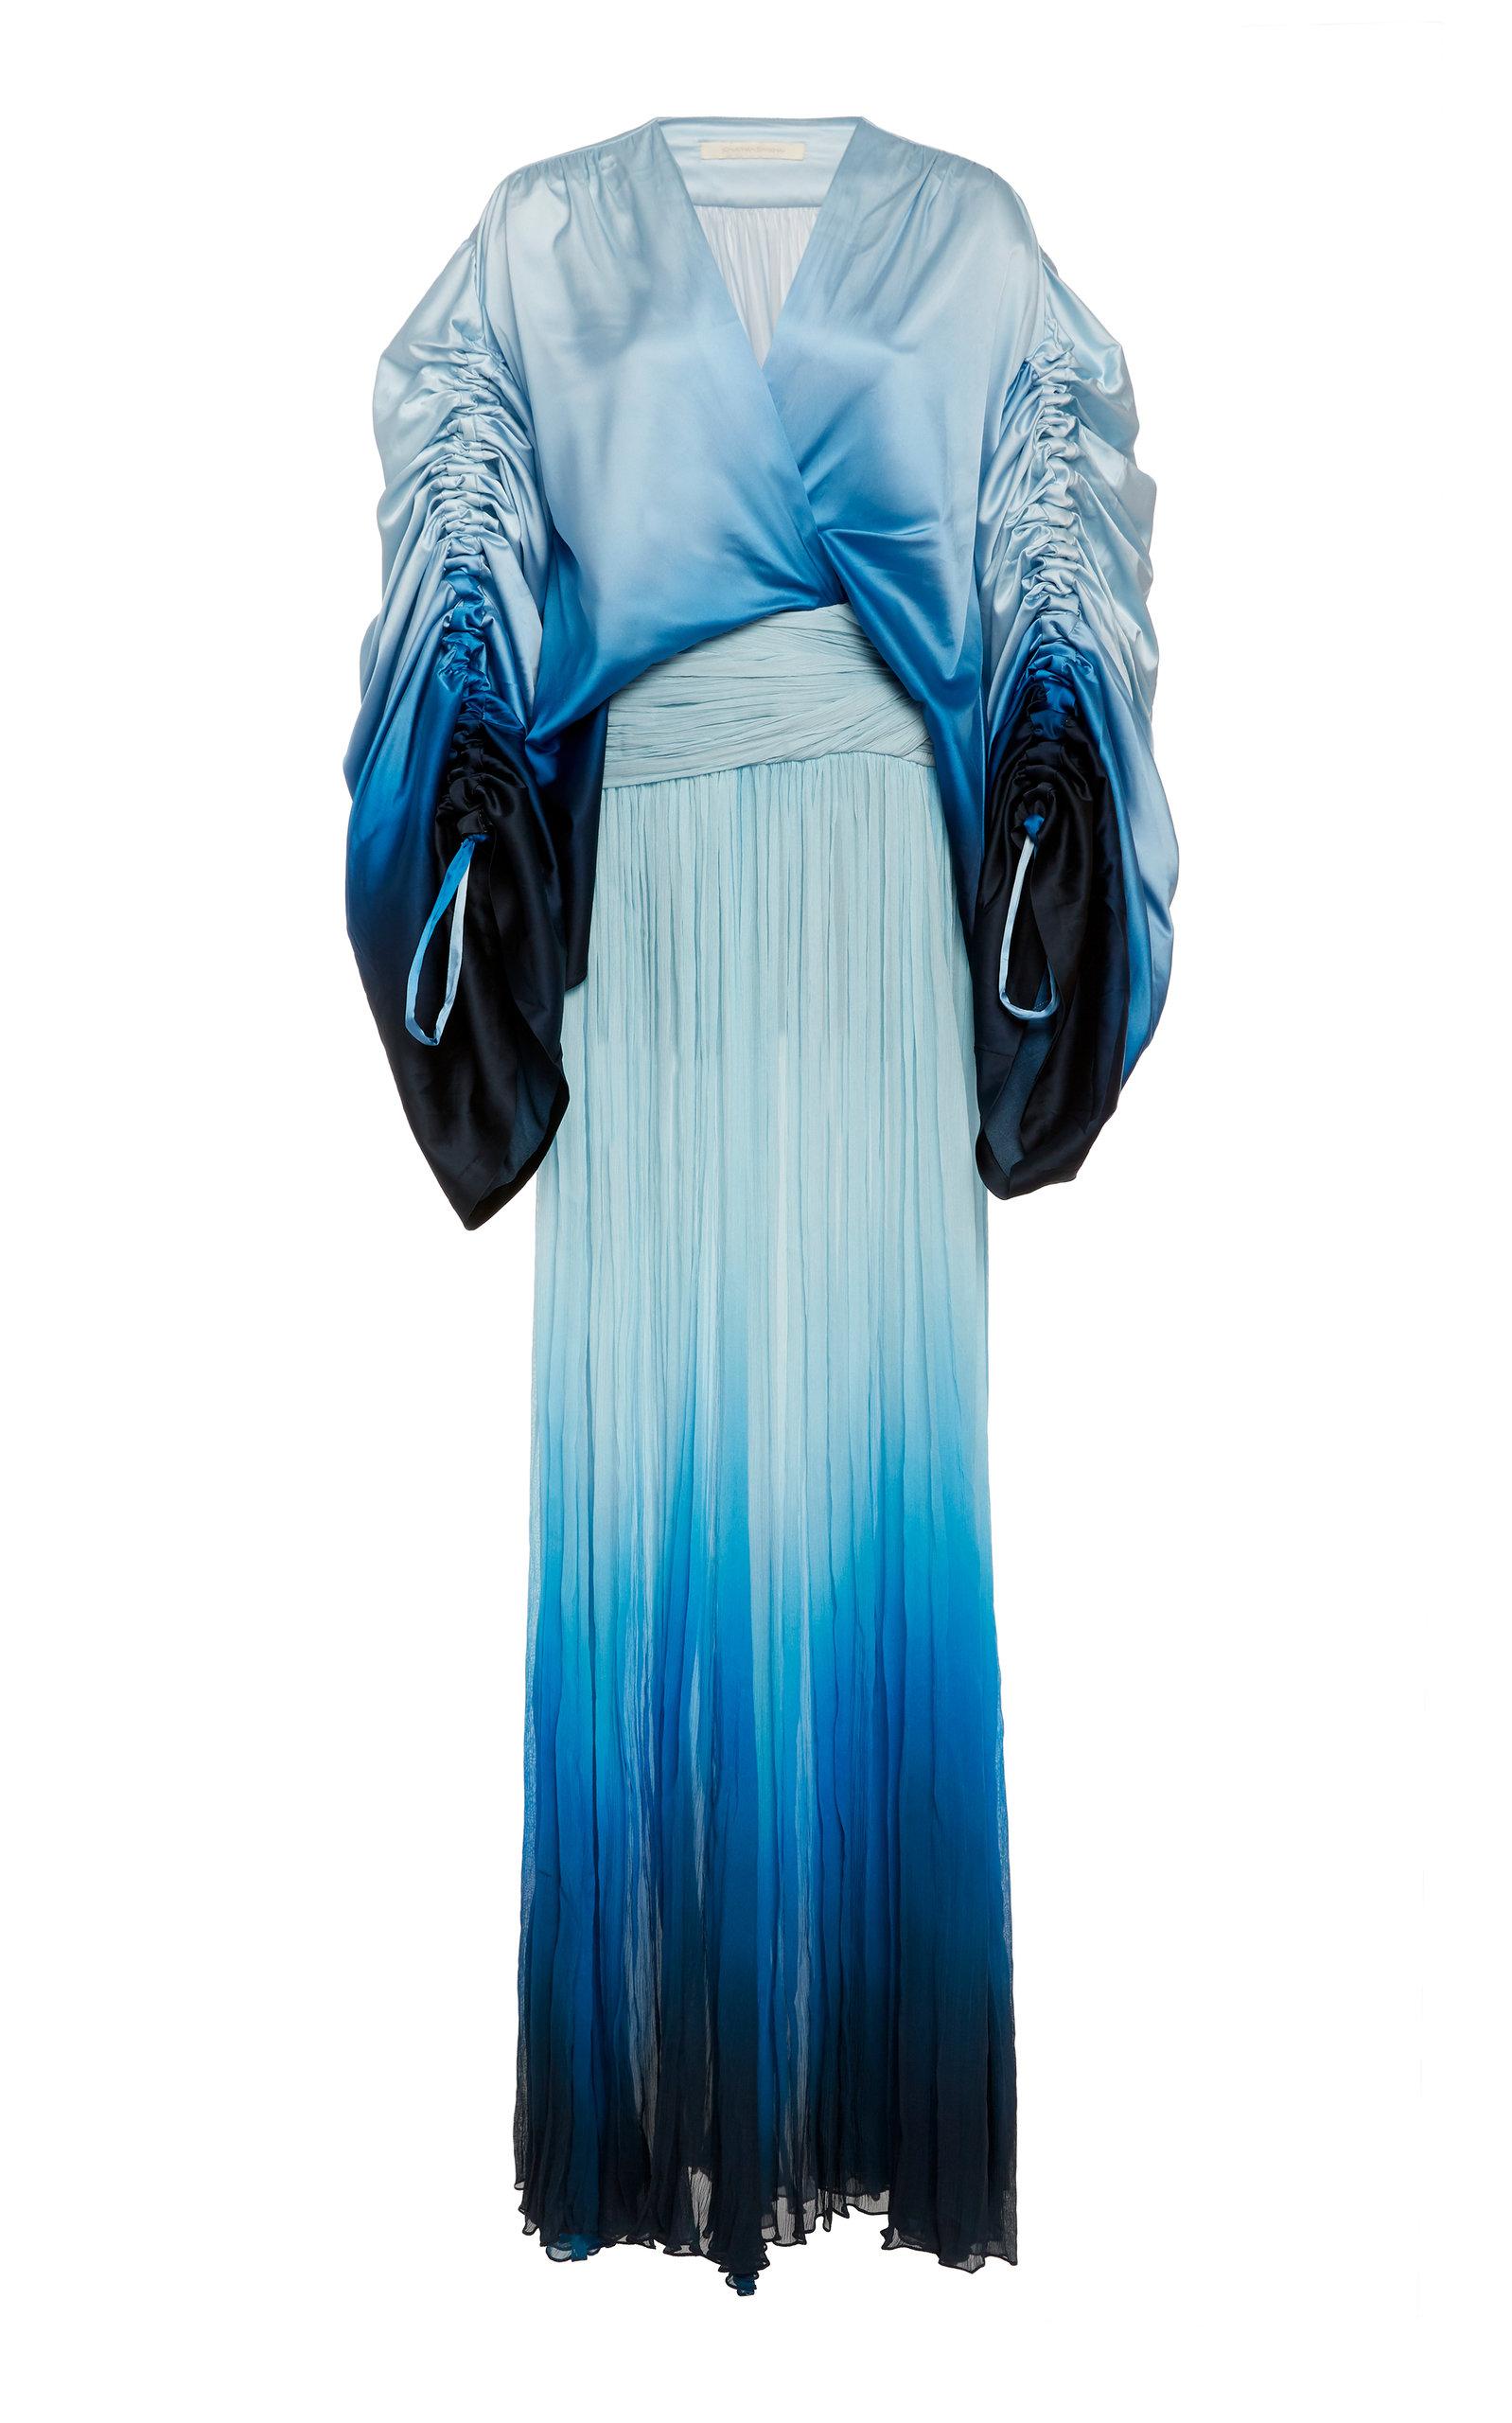 Buy Jonathan Simkhai Ombre Satin And Chiffon Dress online, shop Jonathan Simkhai at the best price